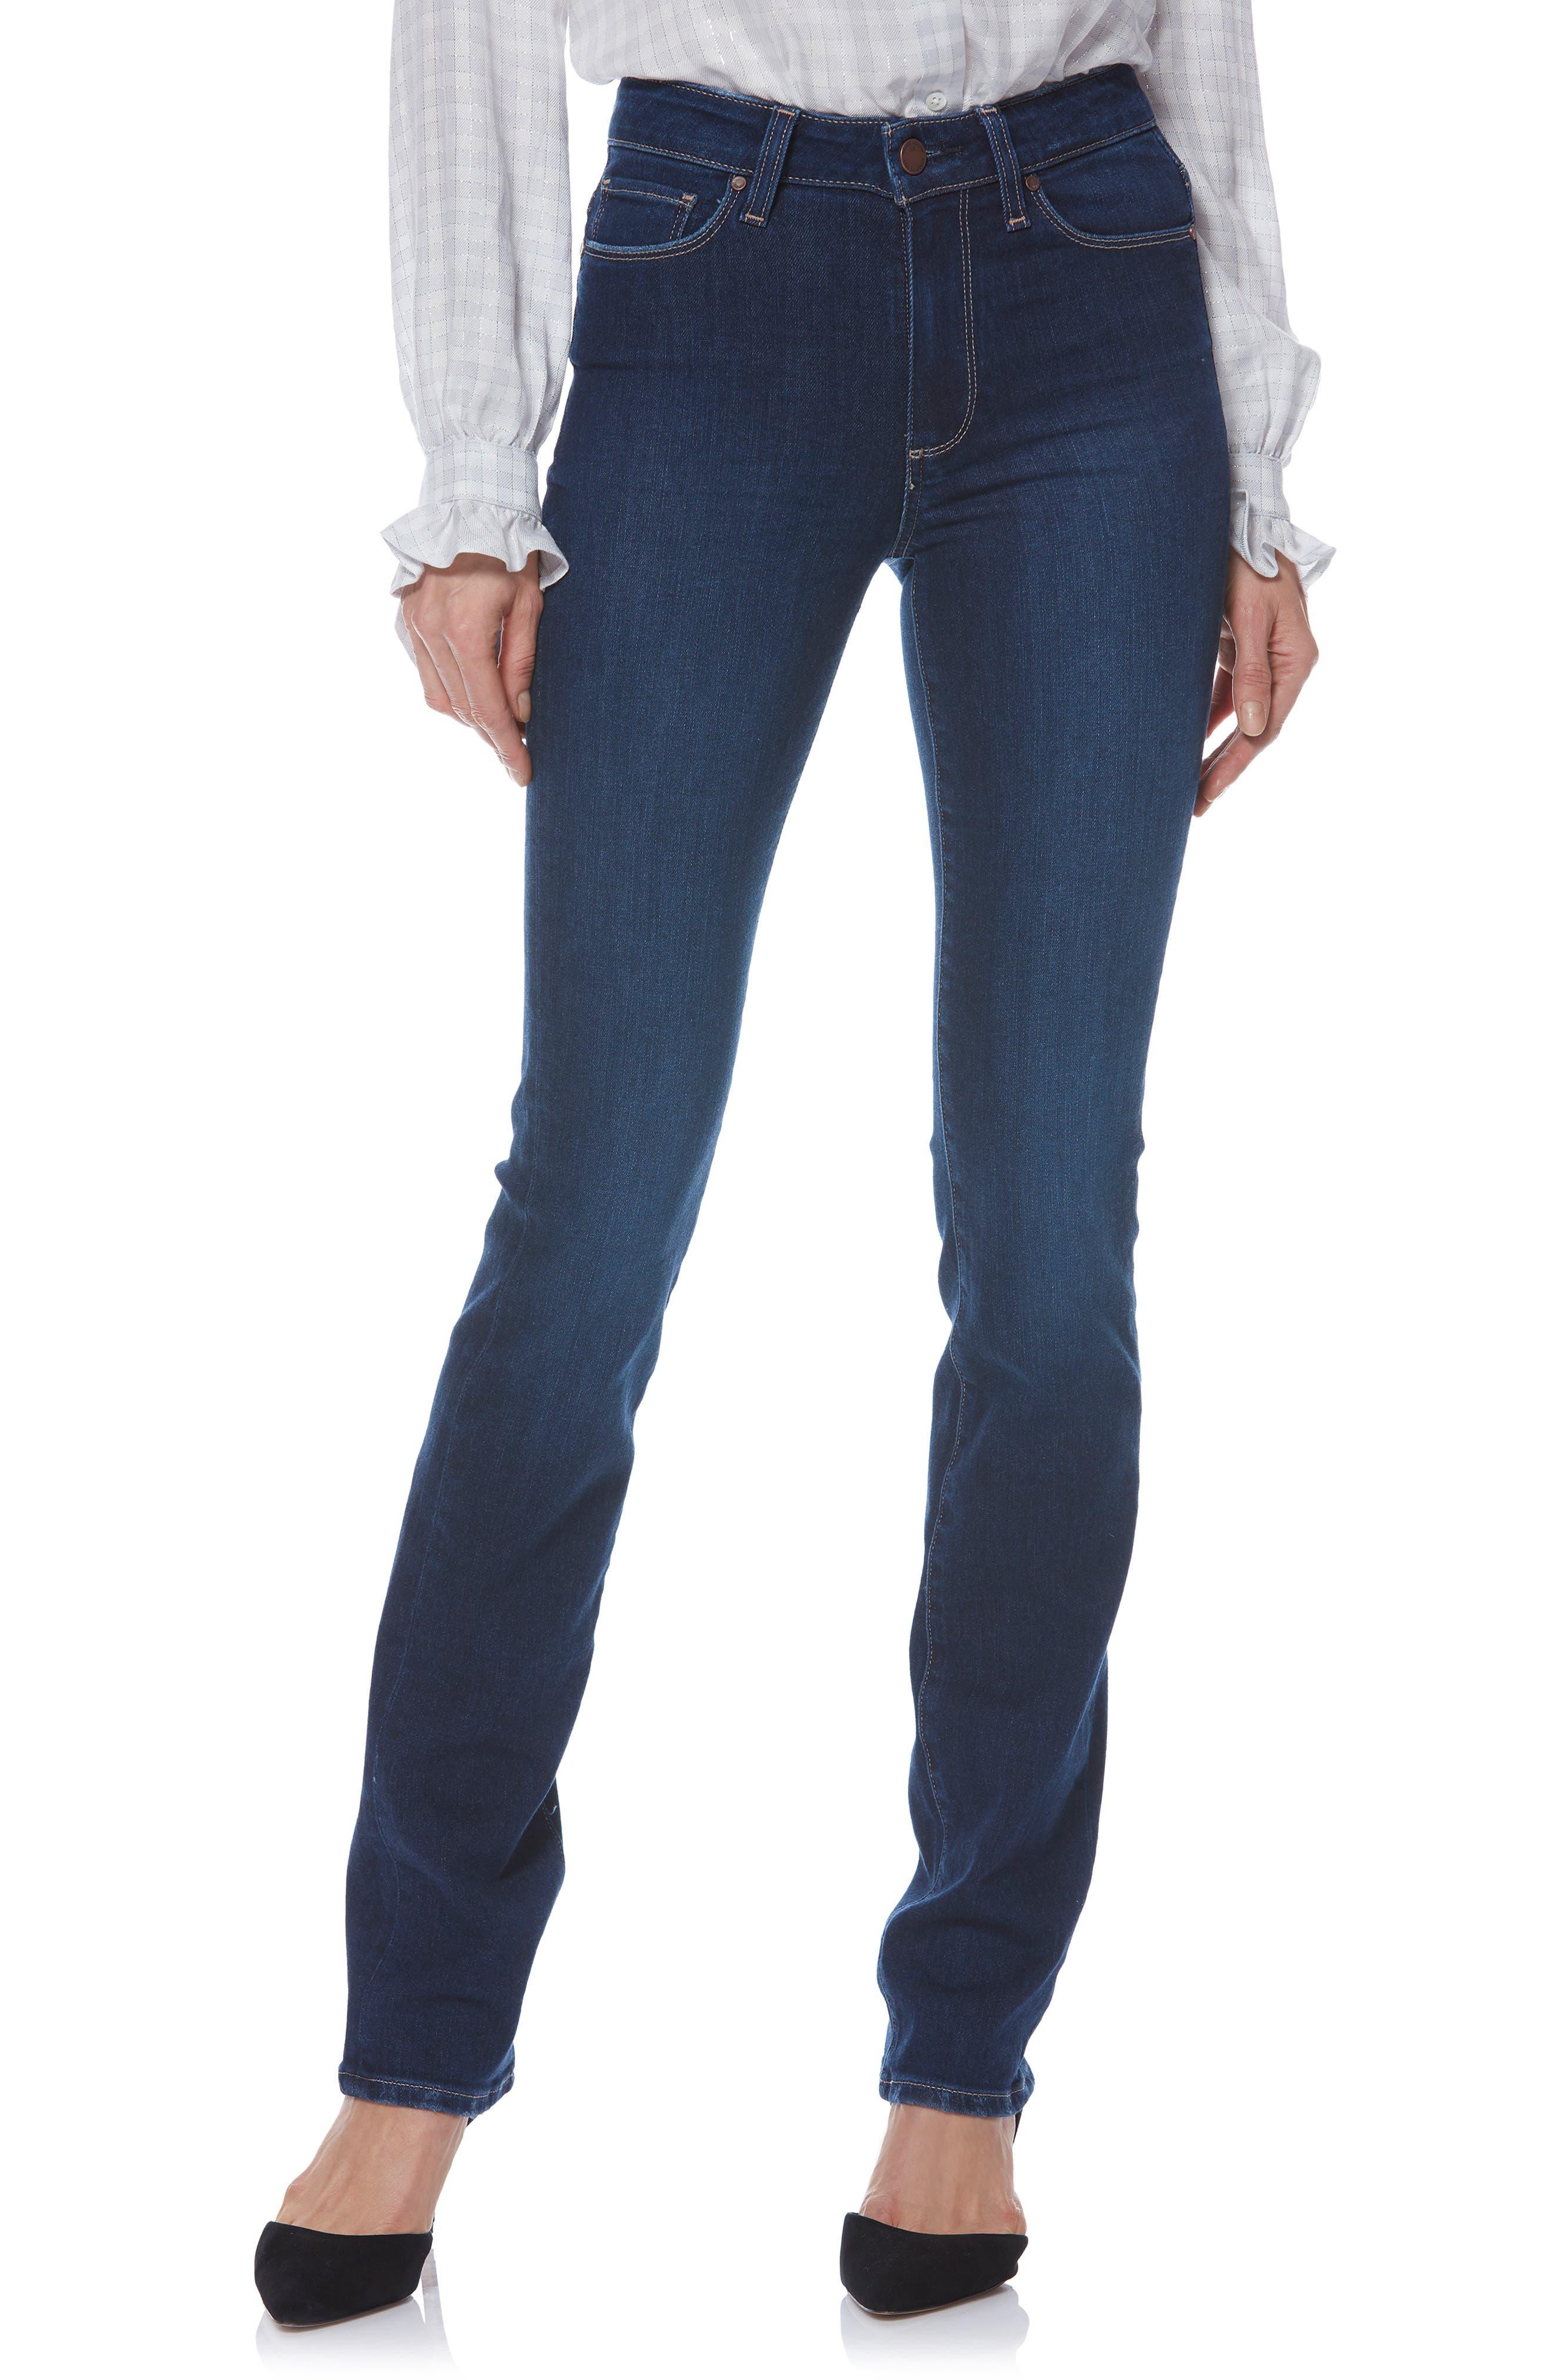 Image of PAIGE Transcend Vintage - Hoxton Straight Leg Jeans